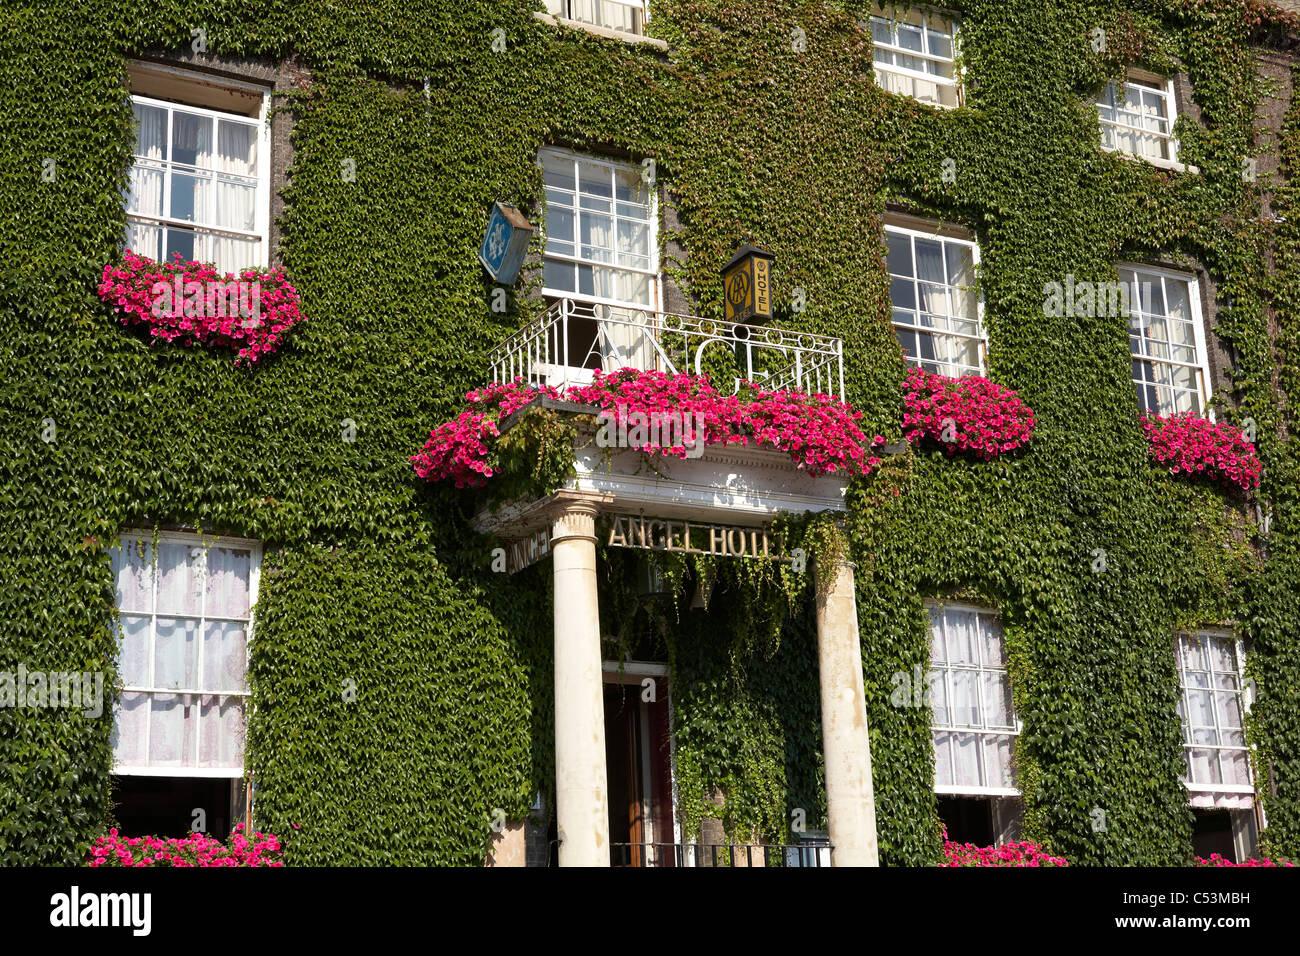 Great Britain England Bury St Edmunds Angel Hotel - Stock Image